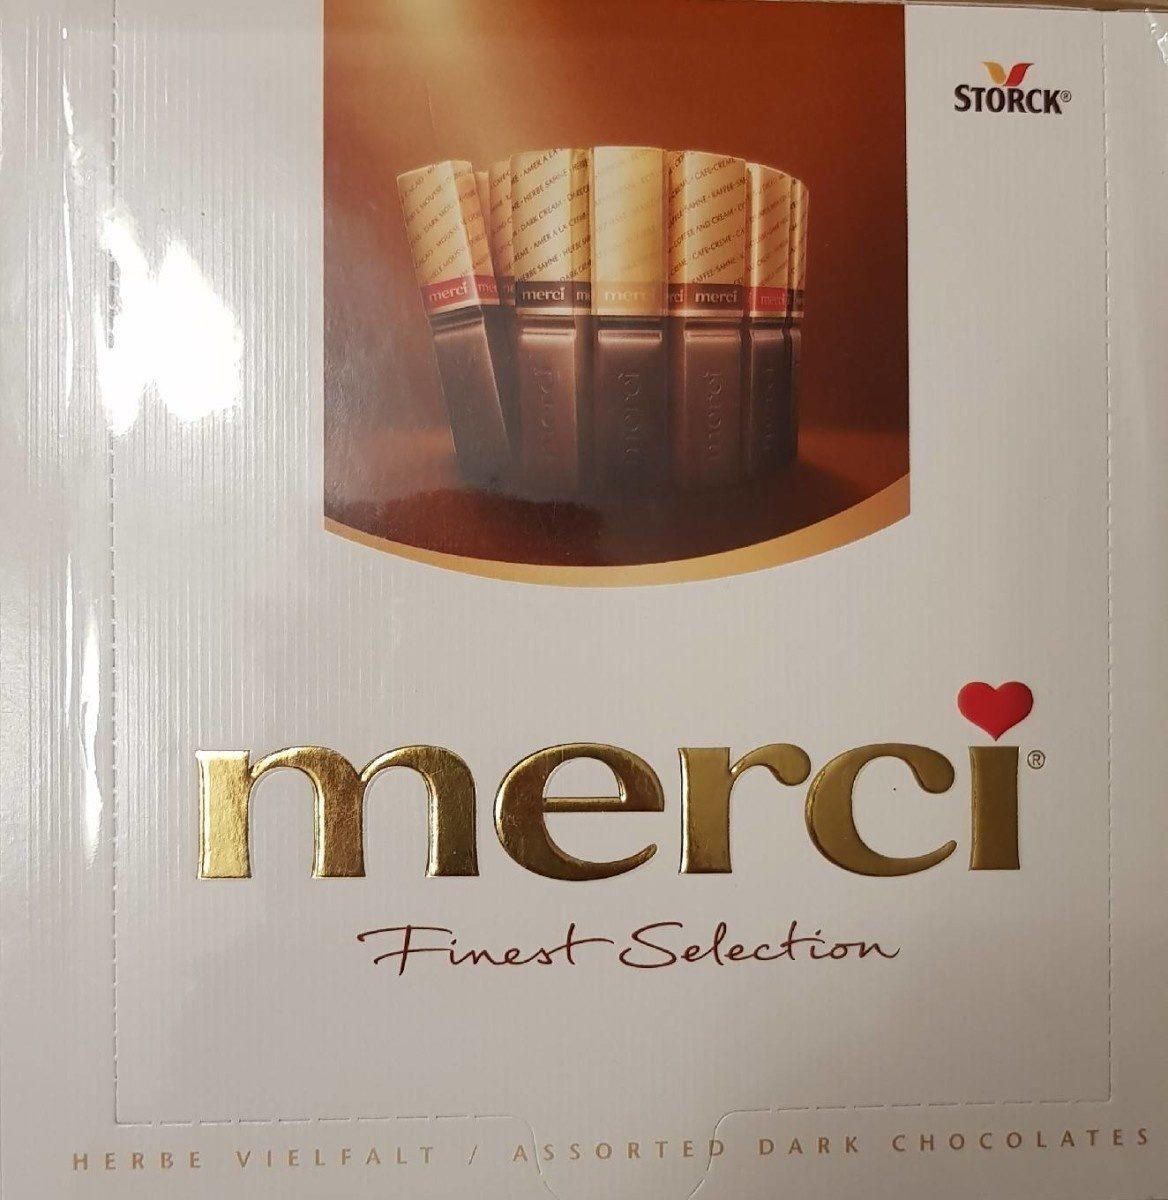 Merci Finest Selektion, - Product